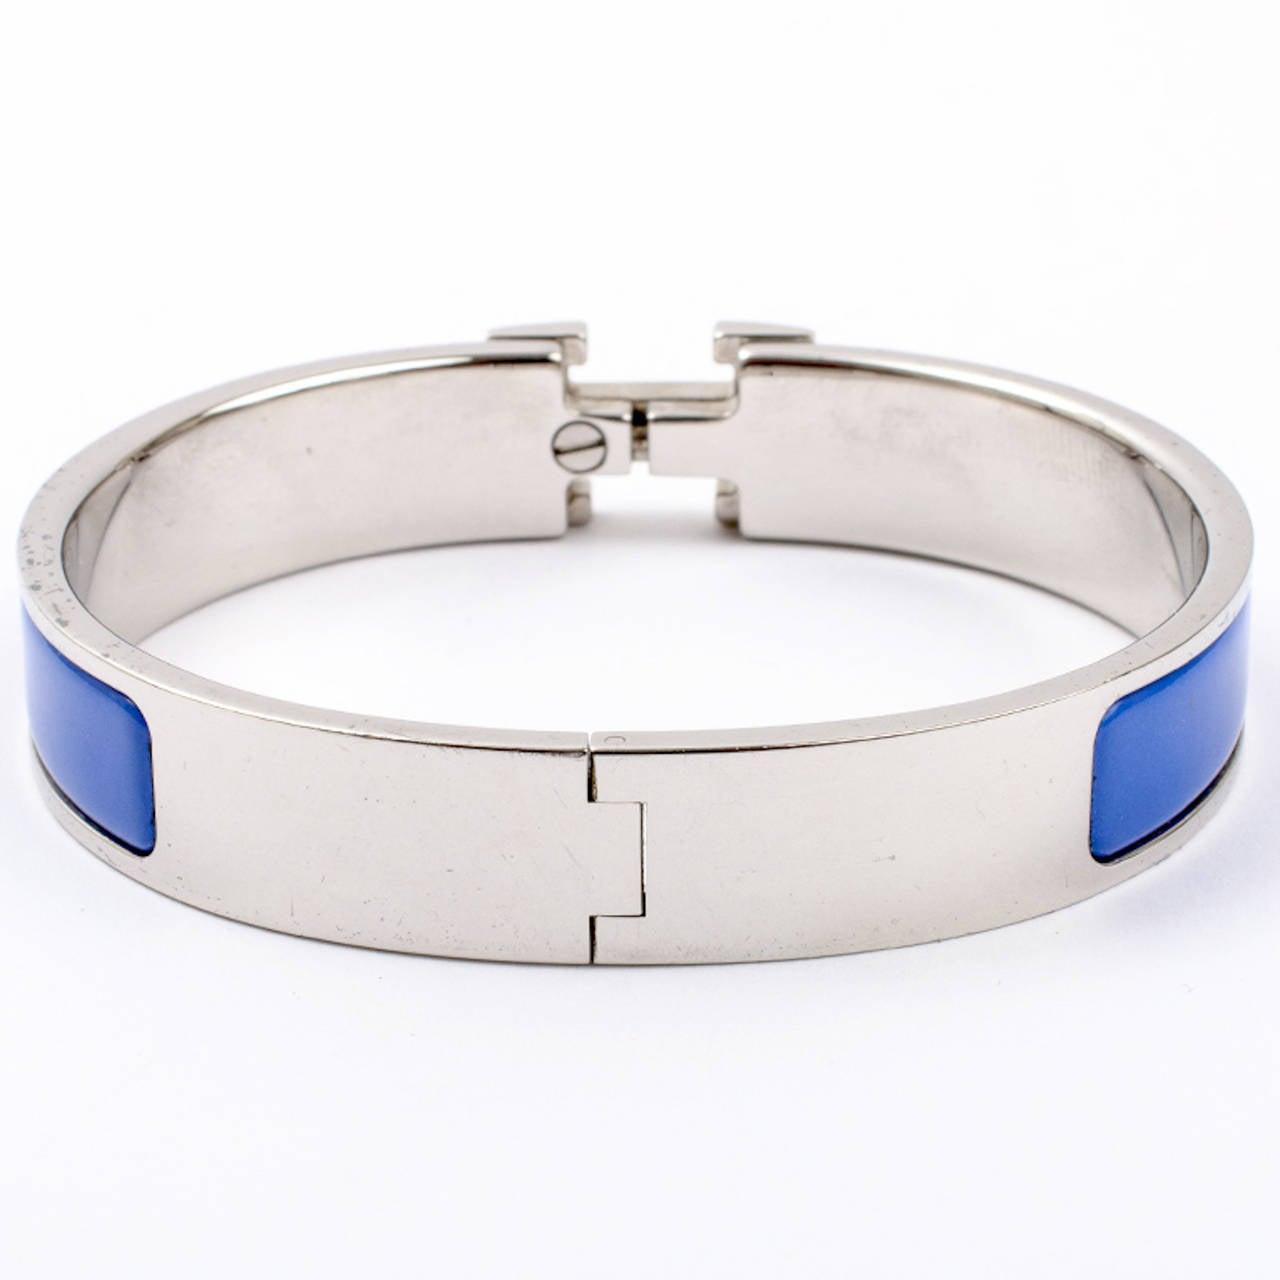 Hermes royal blue clic clac h narrow enamel bracelet gm at for Housse clic clac new york